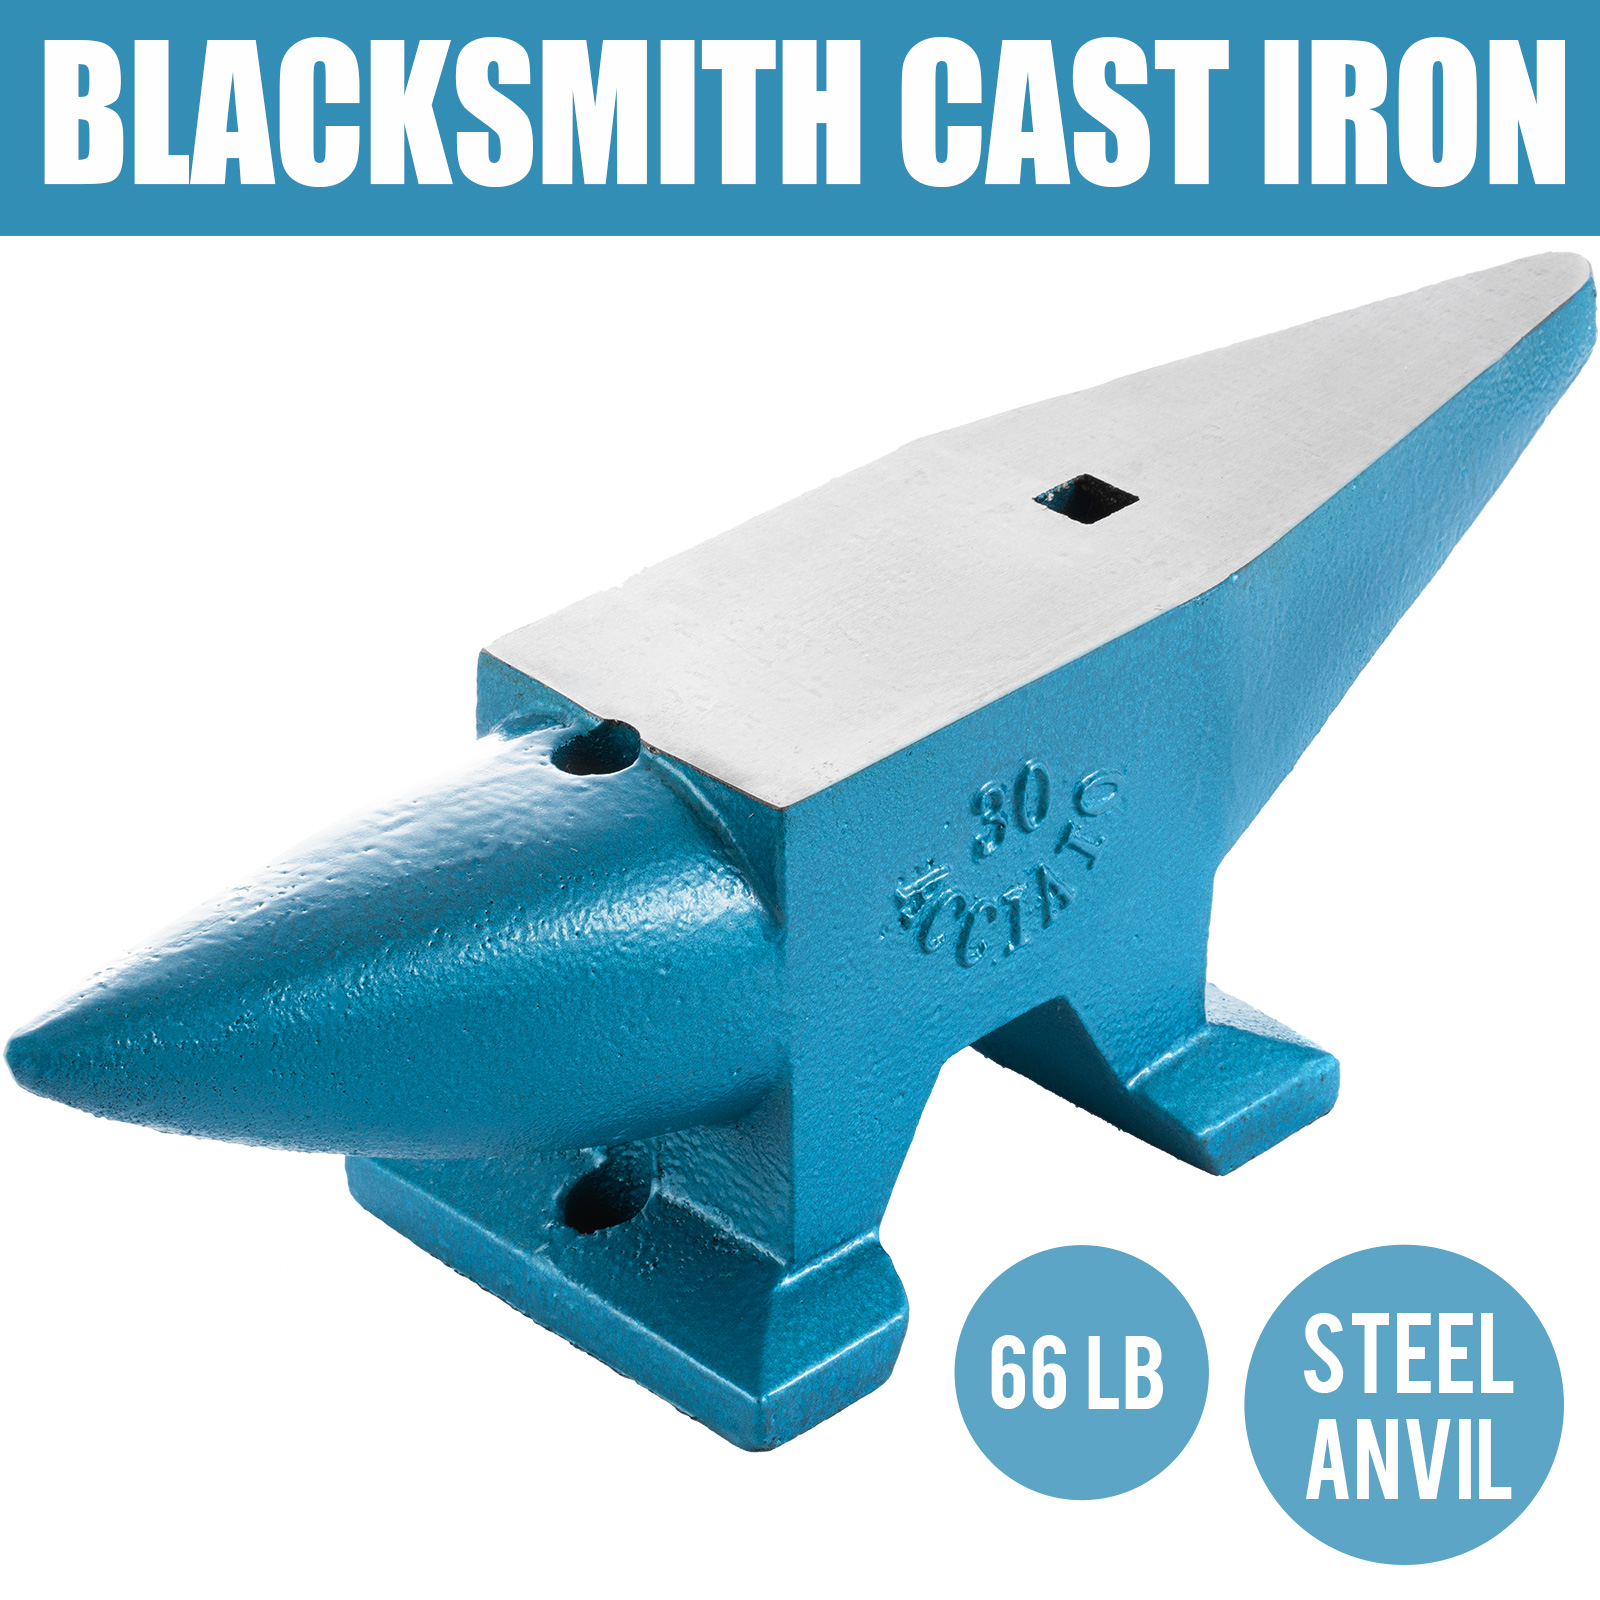 66 LB Blacksmith Anvil Steel Anvil 30kg Solid Heat Treated Round Horn Metal Work